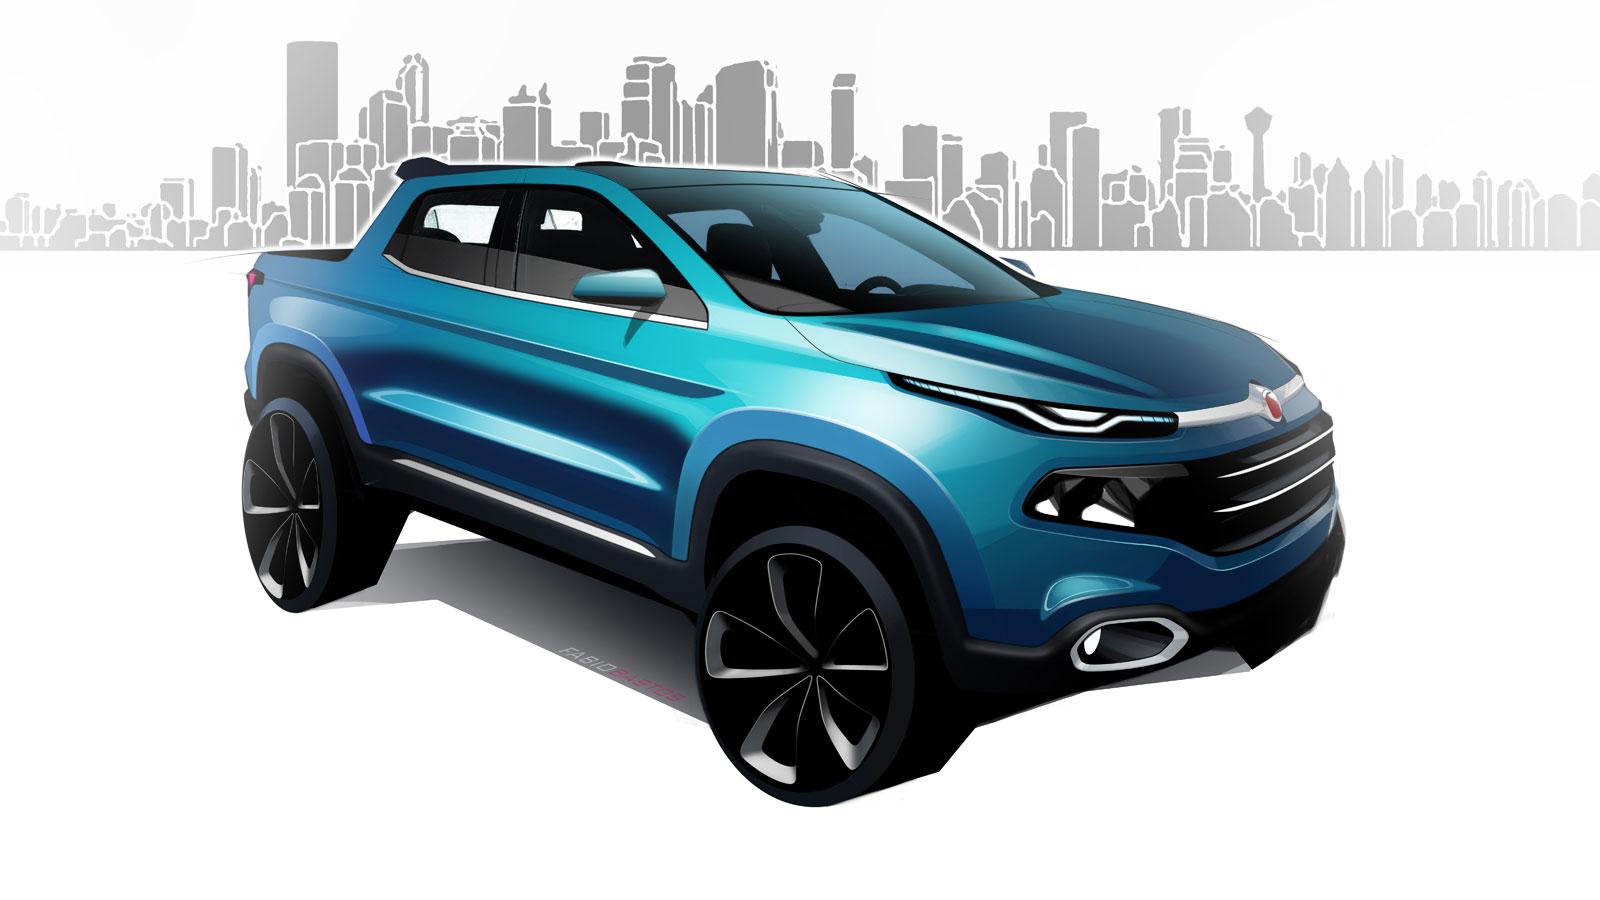 Fiat Toro Design Sketch Render Car Body Design